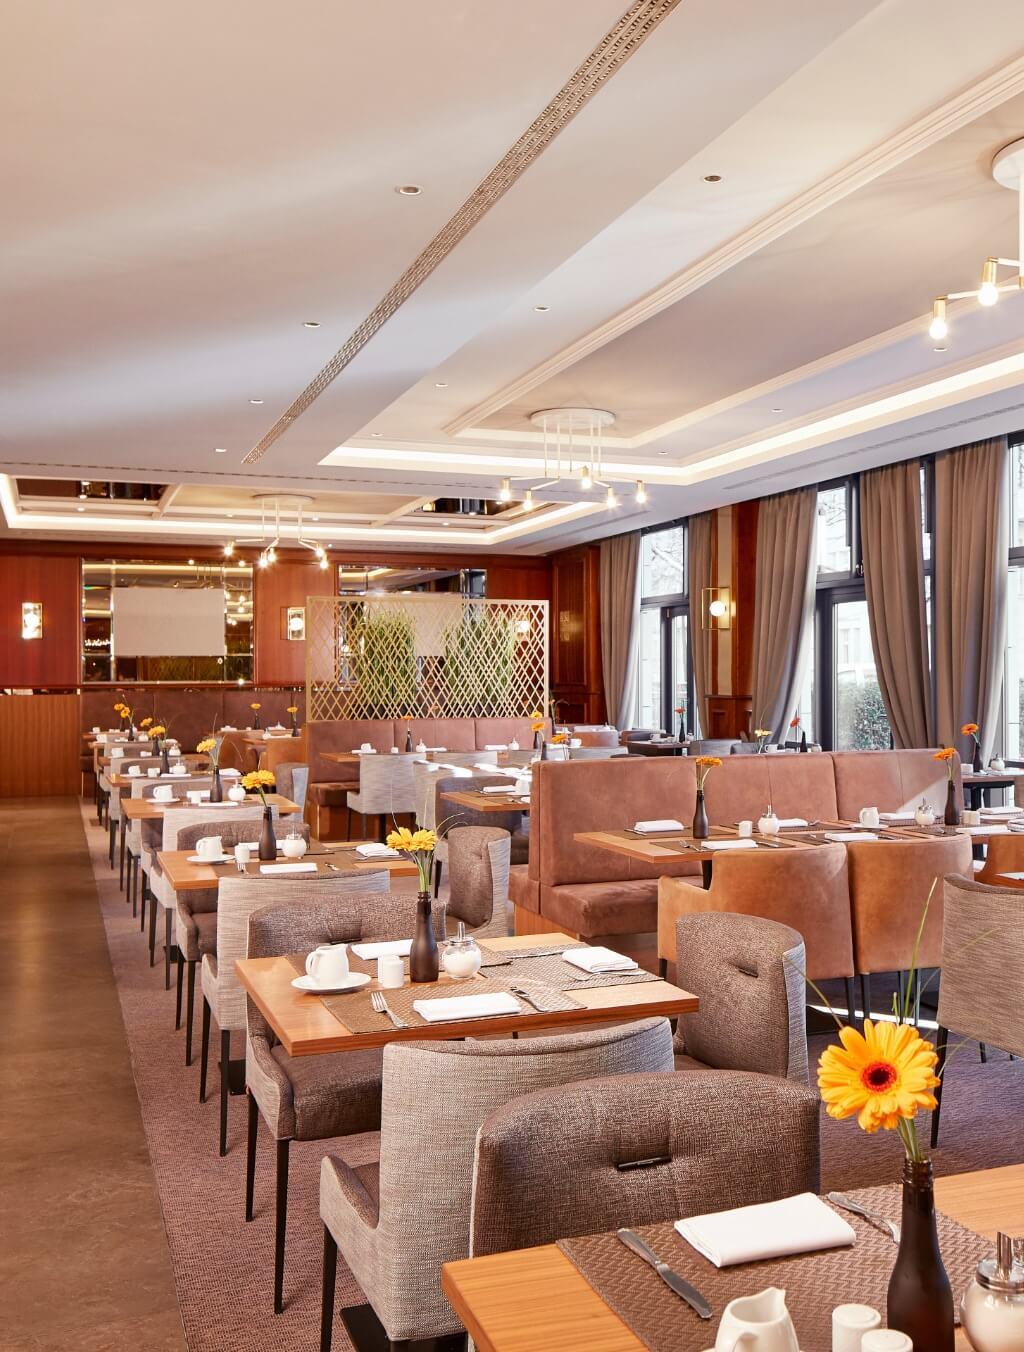 h-hotels_Restaurant-01-hyperion-hotel-berlin_Original-kommerz.-Nutzung-_e854873c@2x